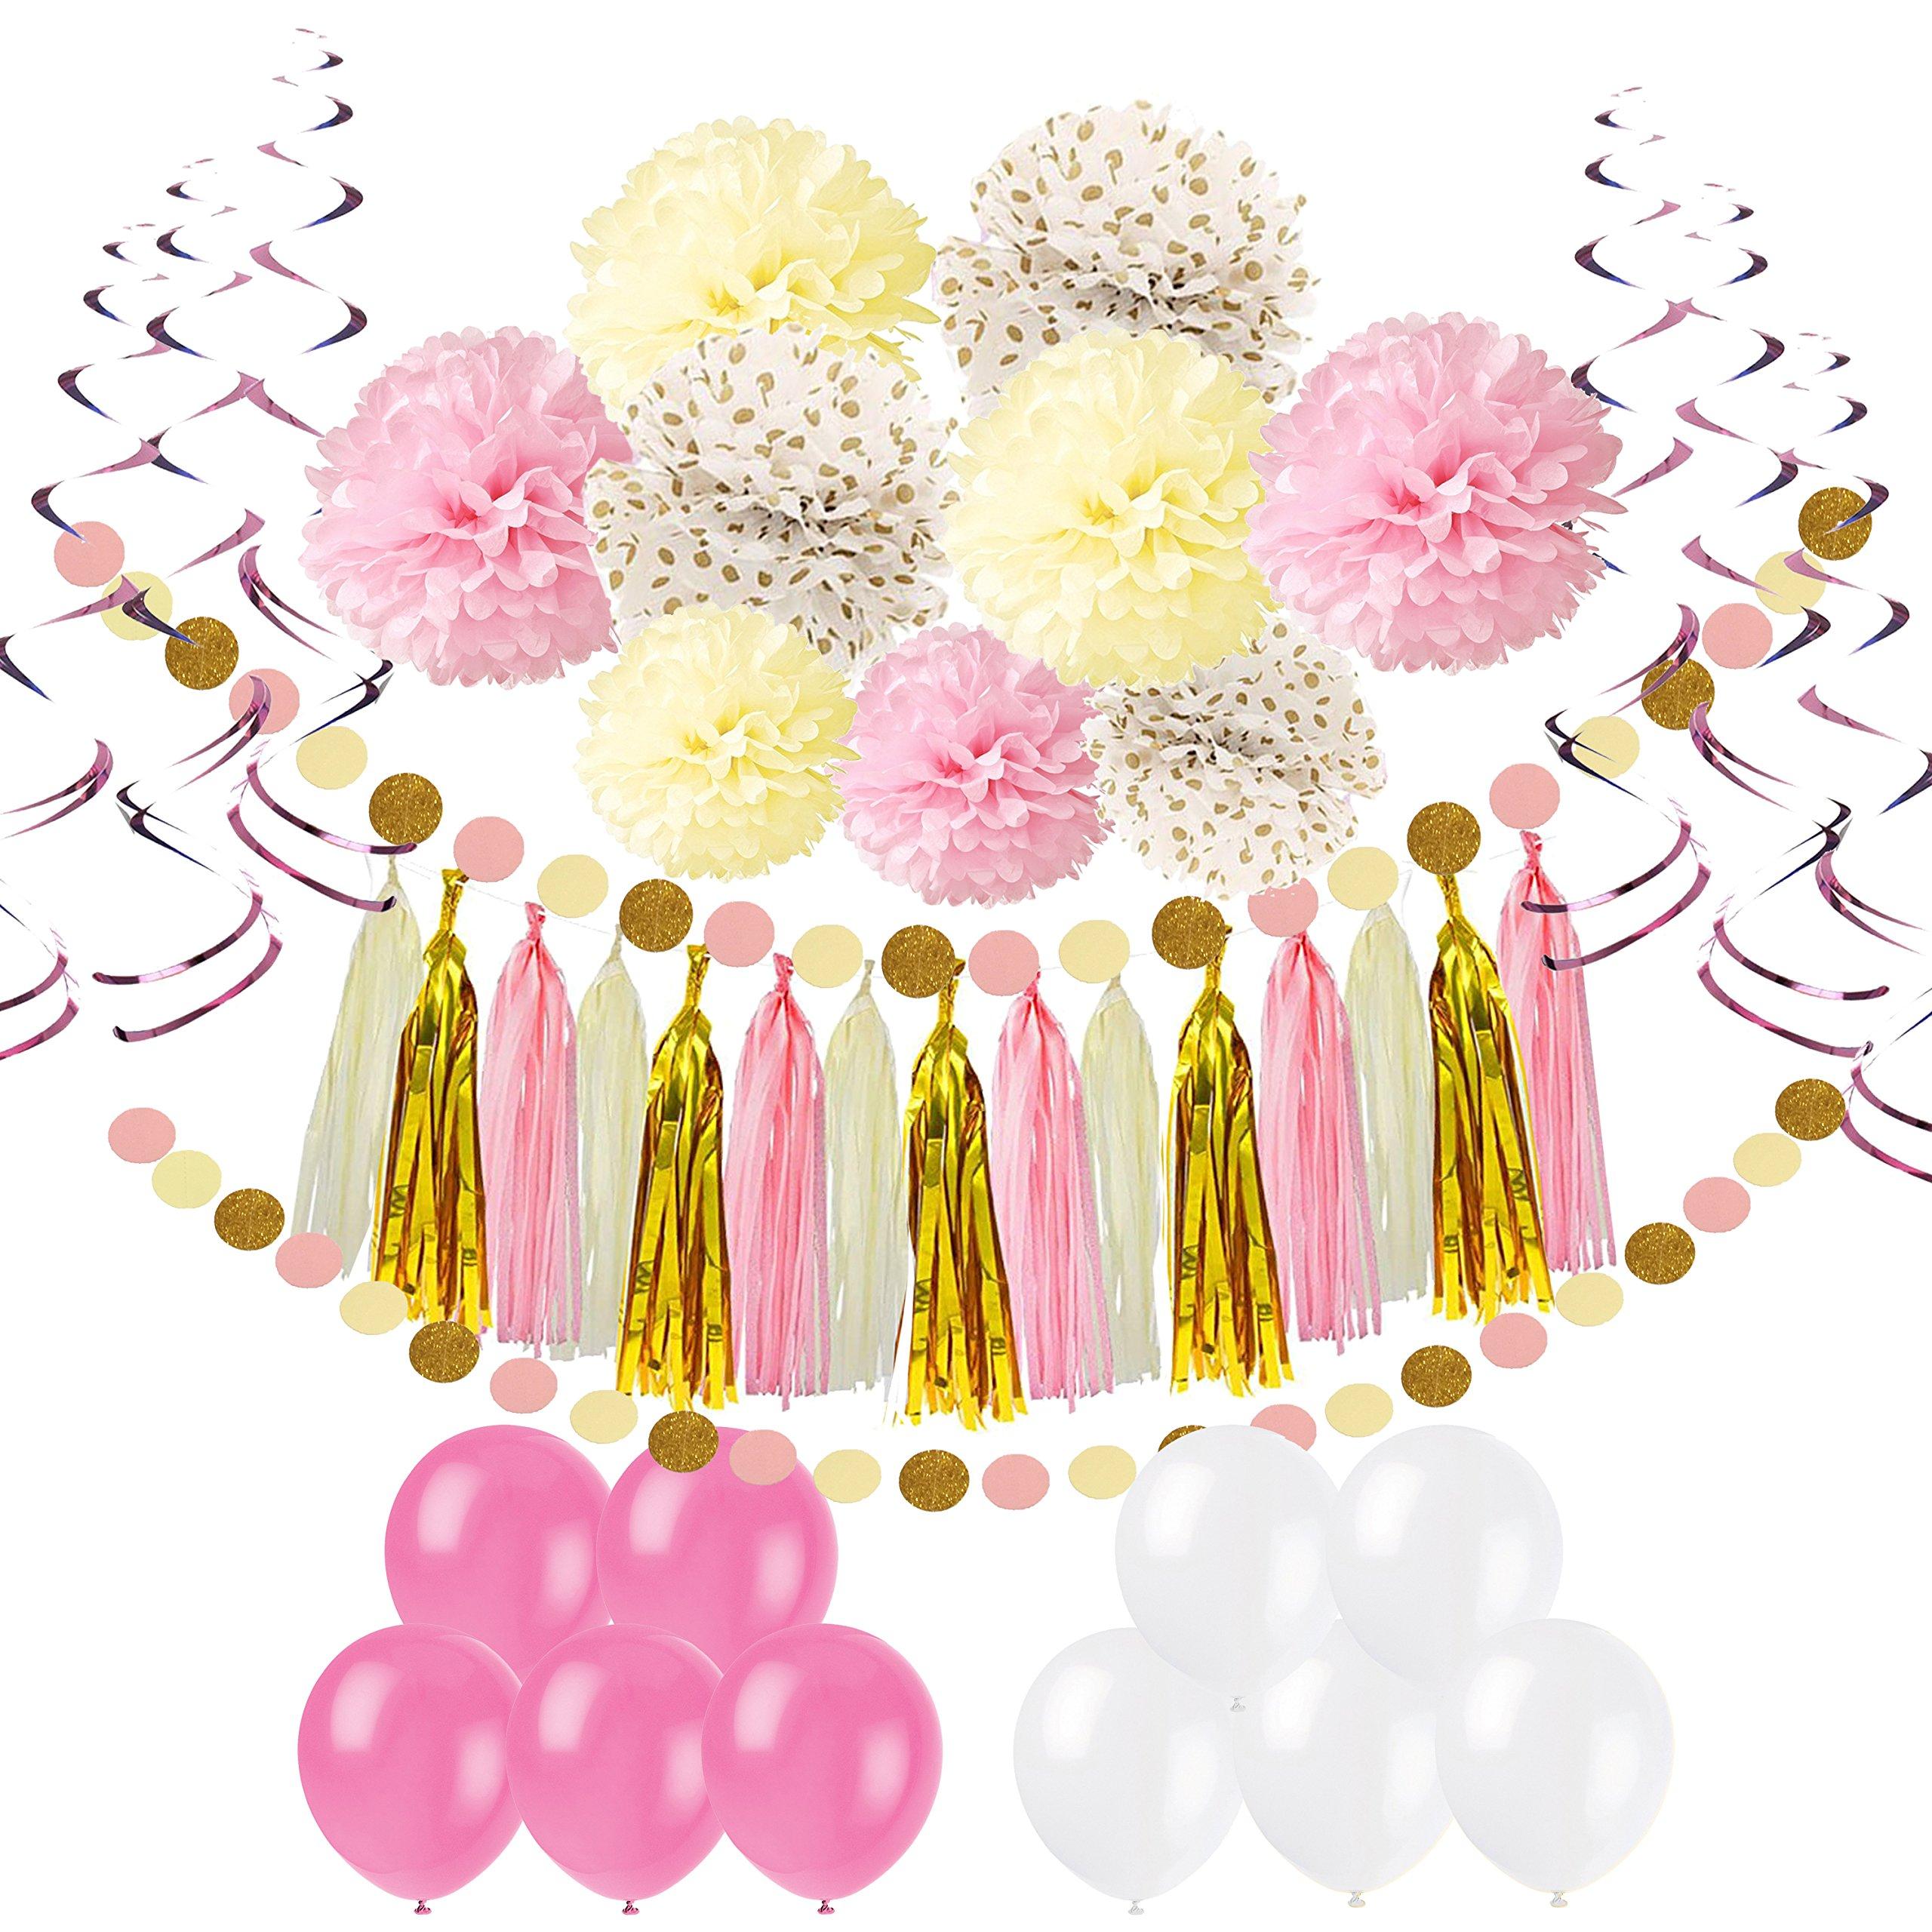 Pietypet Party Decorations, Paper Pom Poms Paper Tassel, Polka Dot Garland, Hanging Swirl Balloon Kit Baby Shower Wedding Birthday Celebration Table Wall Decoration - Pink